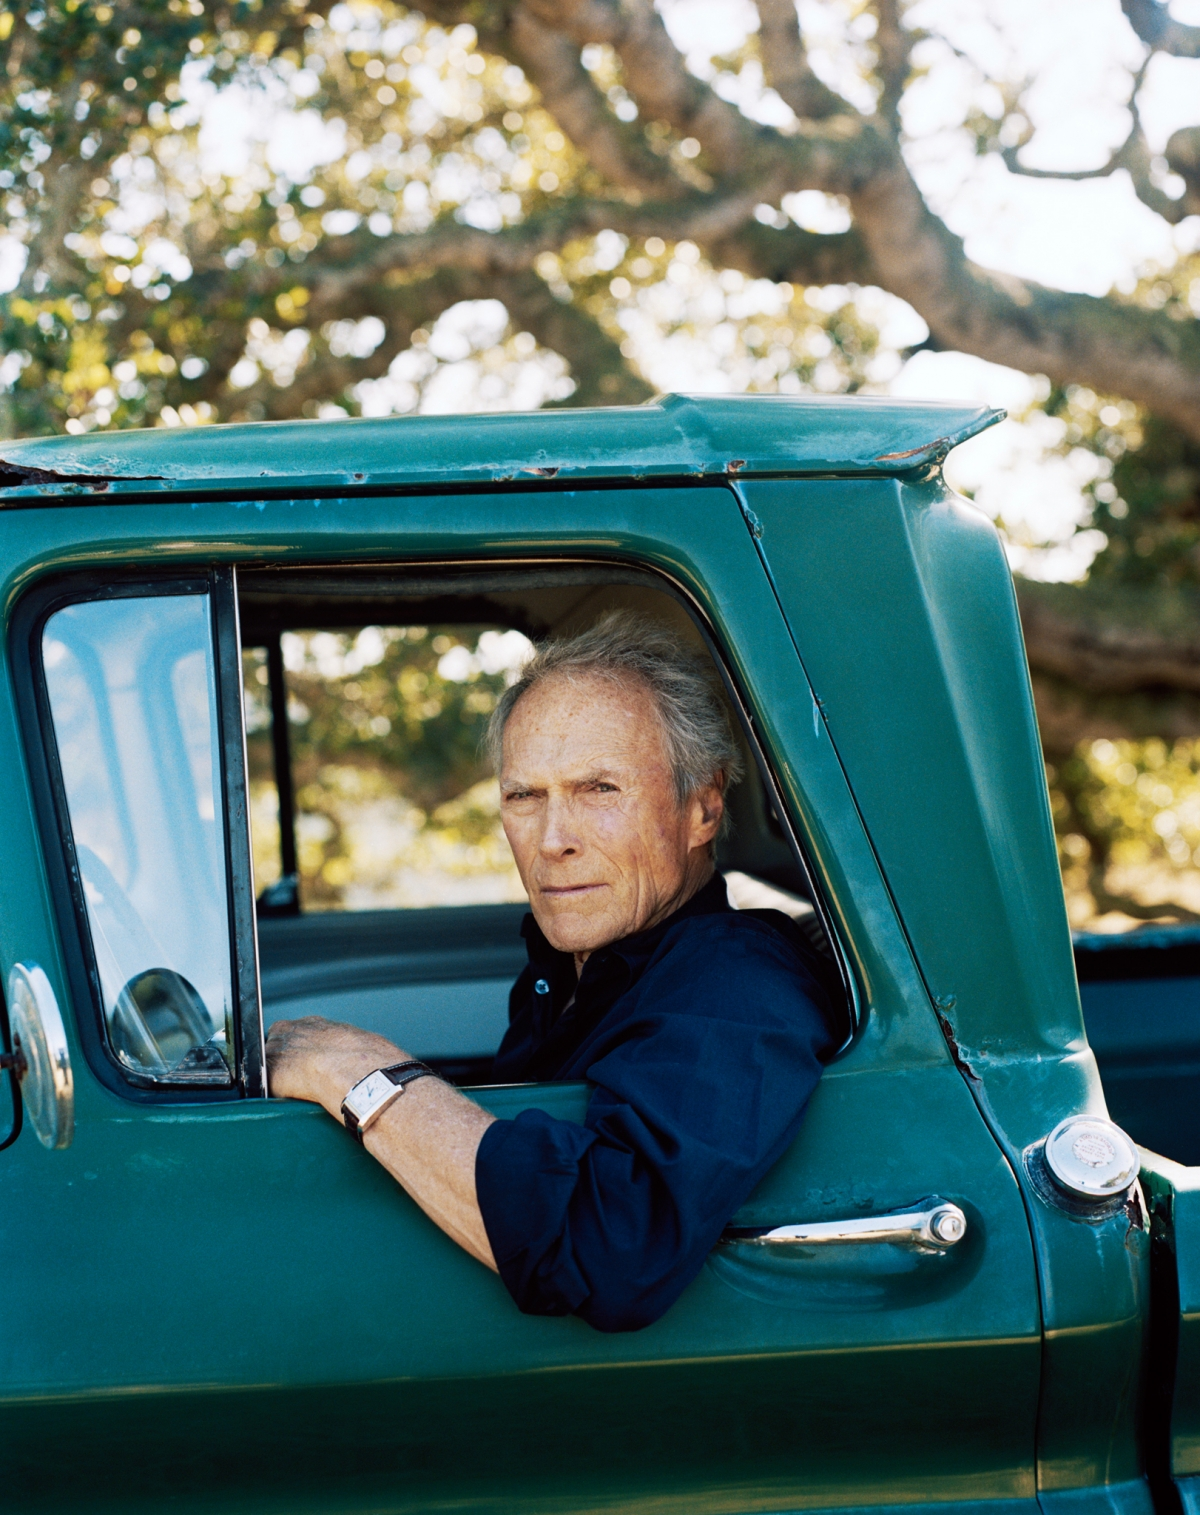 Clint-Eastwood-.jpg